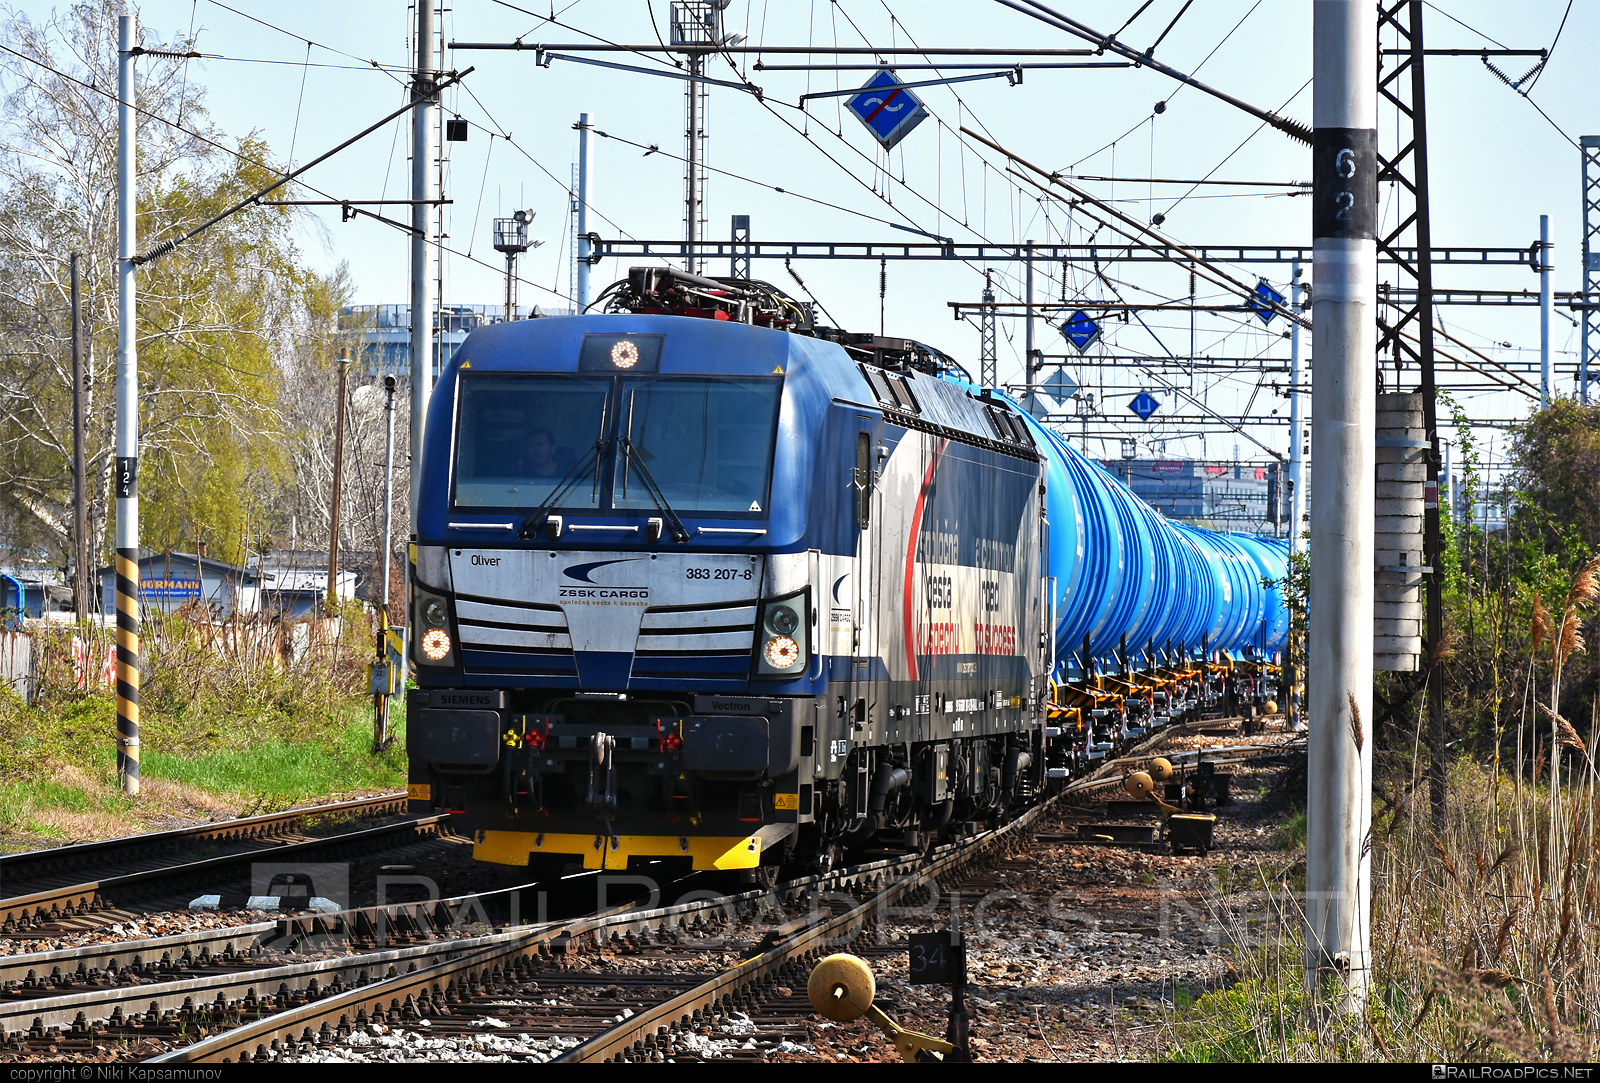 Siemens Vectron MS - 383 207-8 operated by Železničná Spoločnost' Cargo Slovakia a.s. #RollingStockLease #RollingStockLeaseSro #ZeleznicnaSpolocnostCargoSlovakia #kesselwagen #raill #siemens #siemensvectron #siemensvectronms #tankwagon #vectron #vectronms #zsskcargo